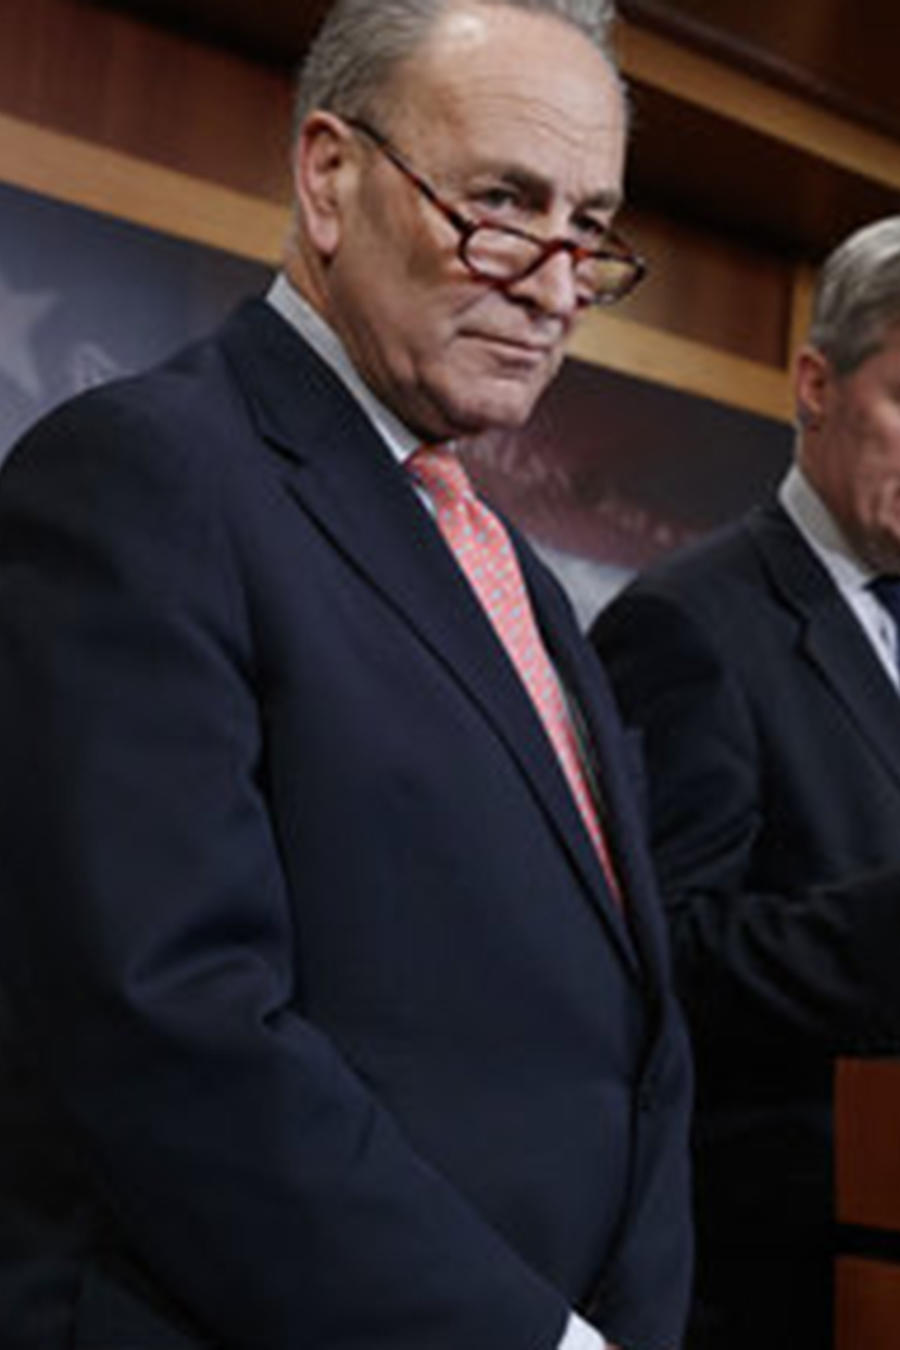 Chuck Schumer,Sheldon Whitehouse,Richard Blumenthal